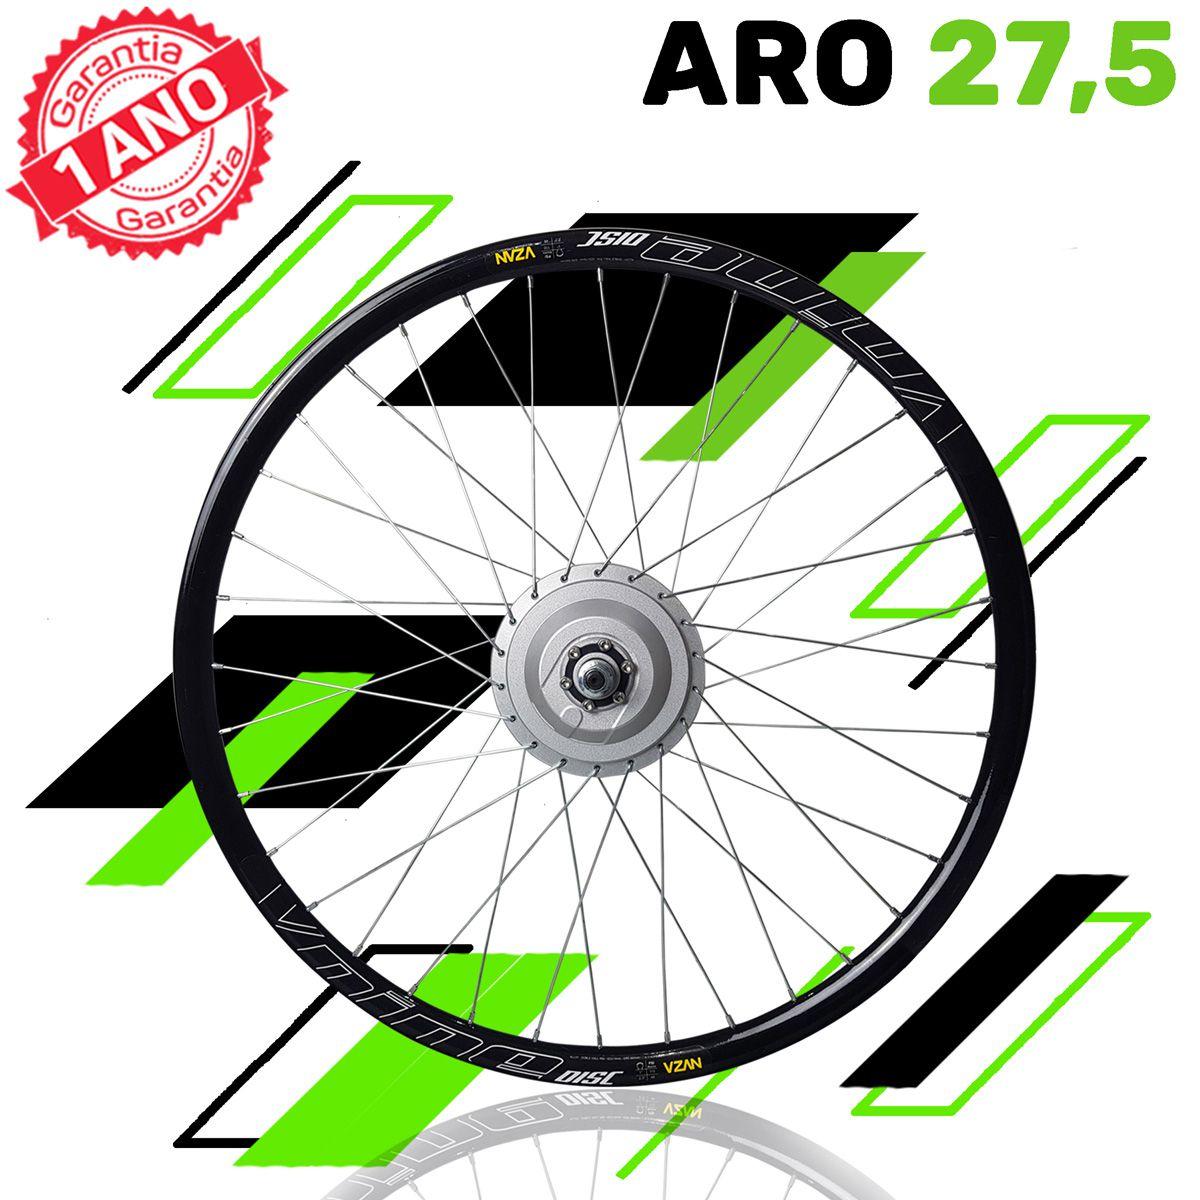 Kit Elétrico para Bicicleta - TecBike - Bateria de Trapézio - 350 Watts 36V - Aro 27,5